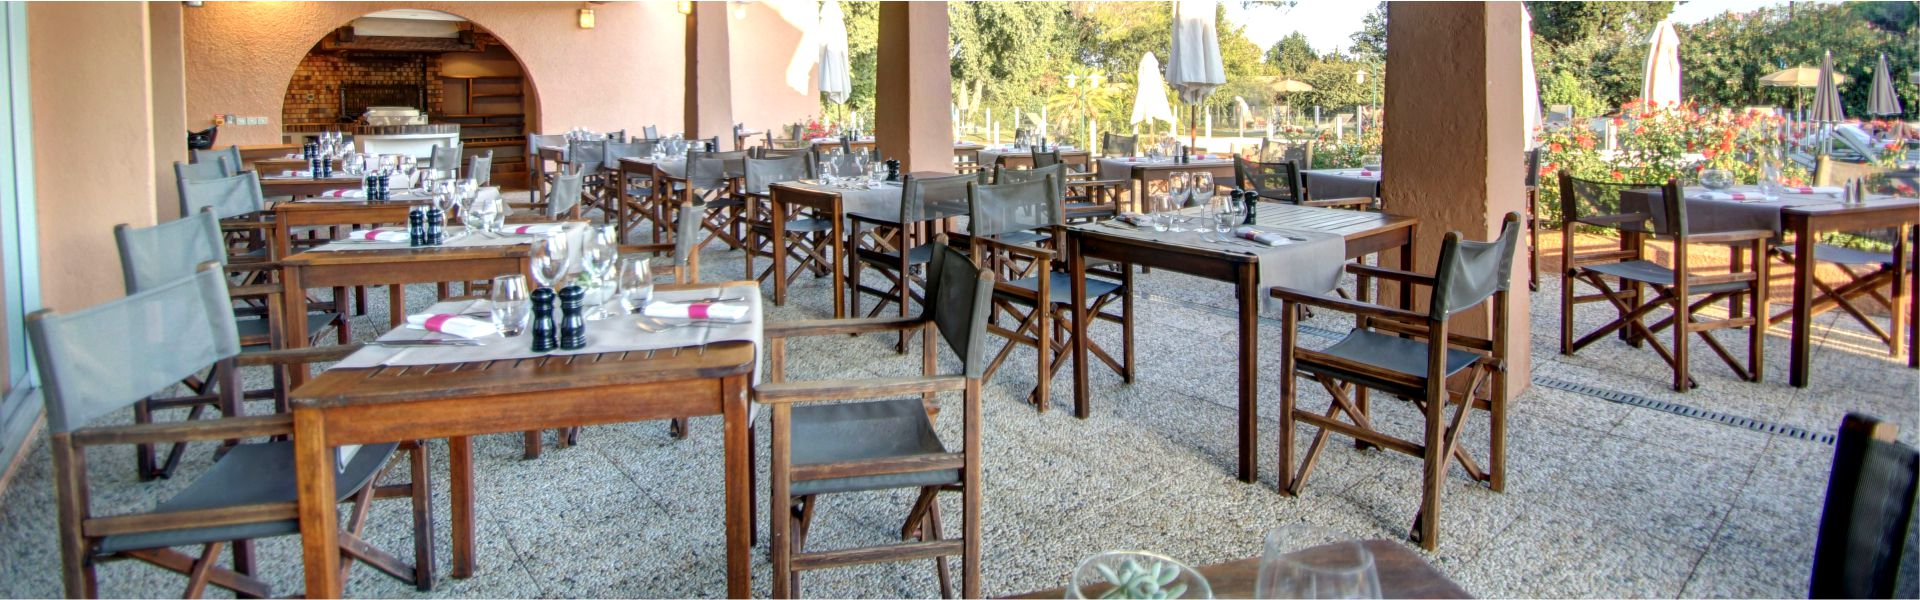 Terrasse du restaurant Najeti Les Pins Parasols.